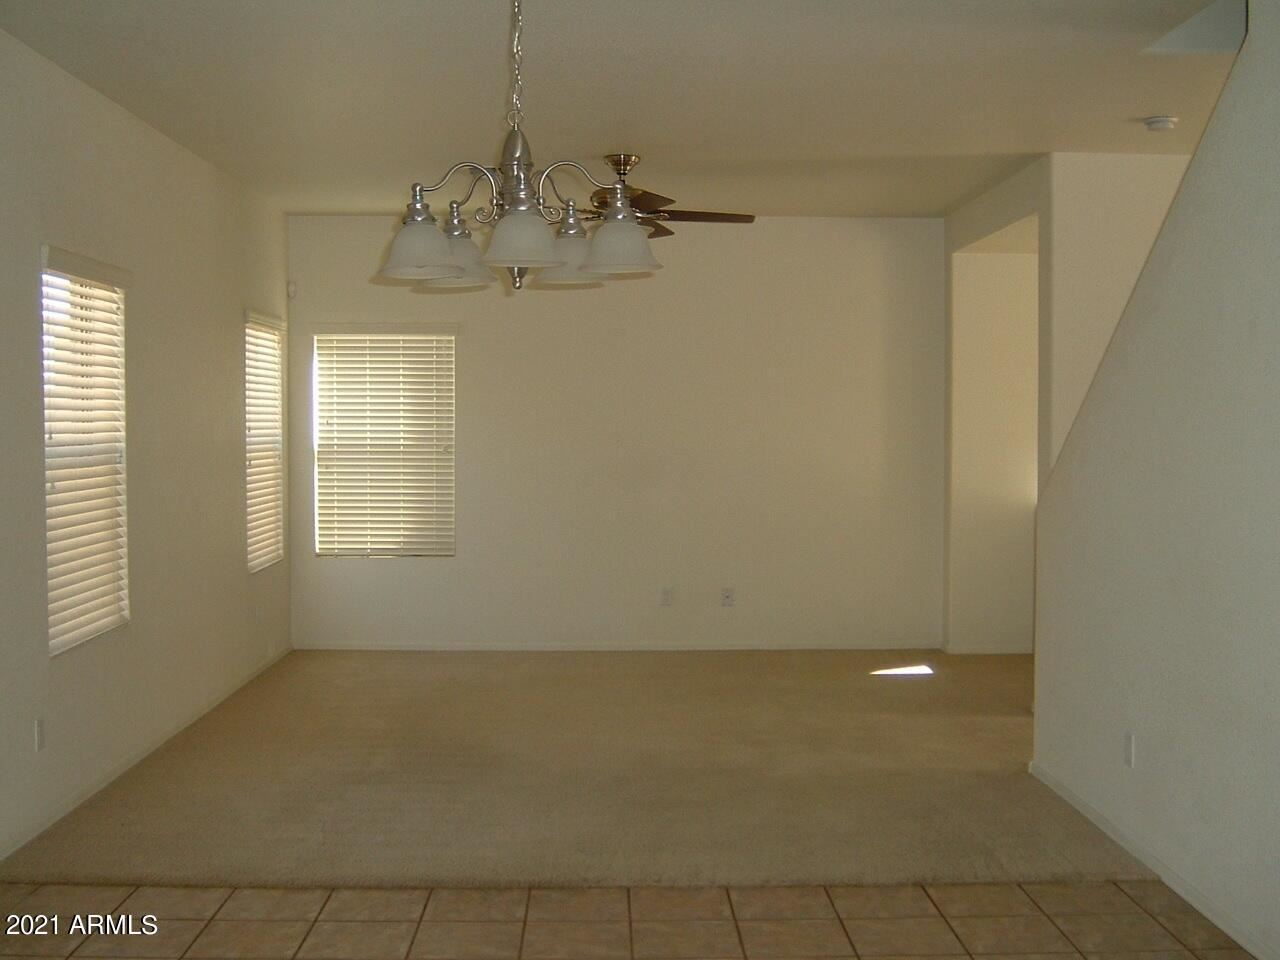 Photo of 8160 W PALO VERDE Avenue, Peoria, AZ 85345 (MLS # 6249703)